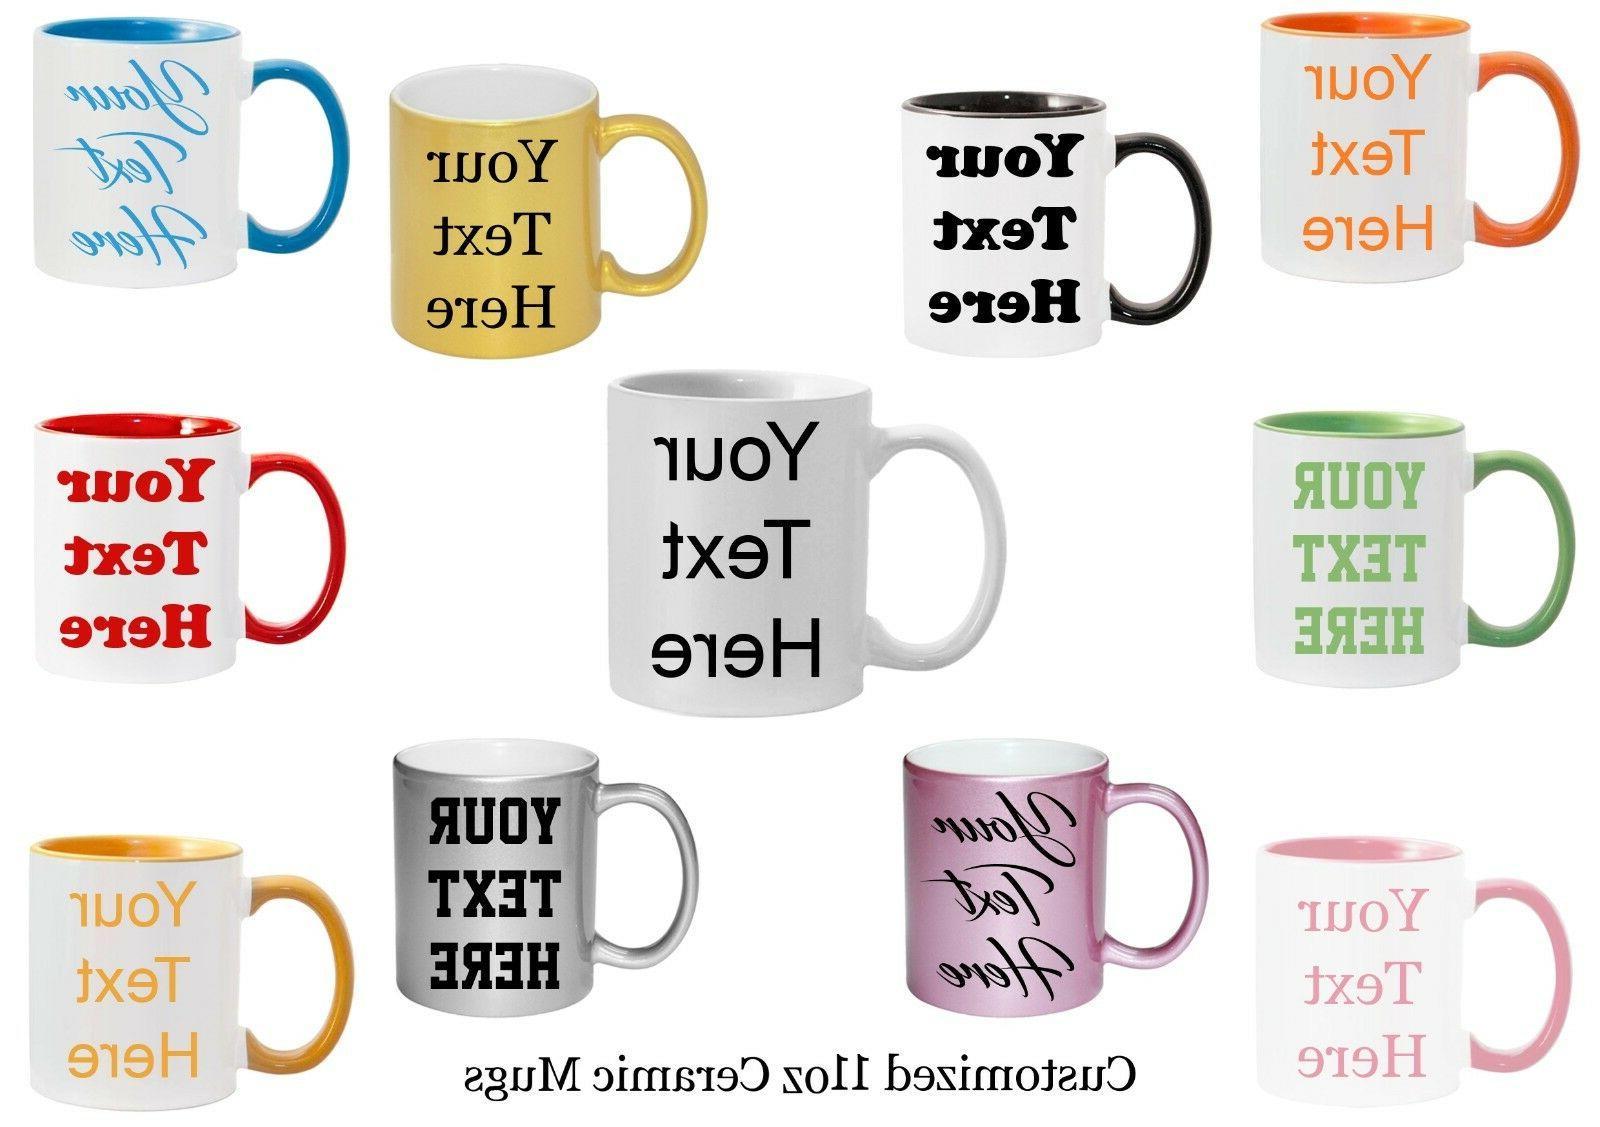 customized mugs 7 ceramic mugs to choose